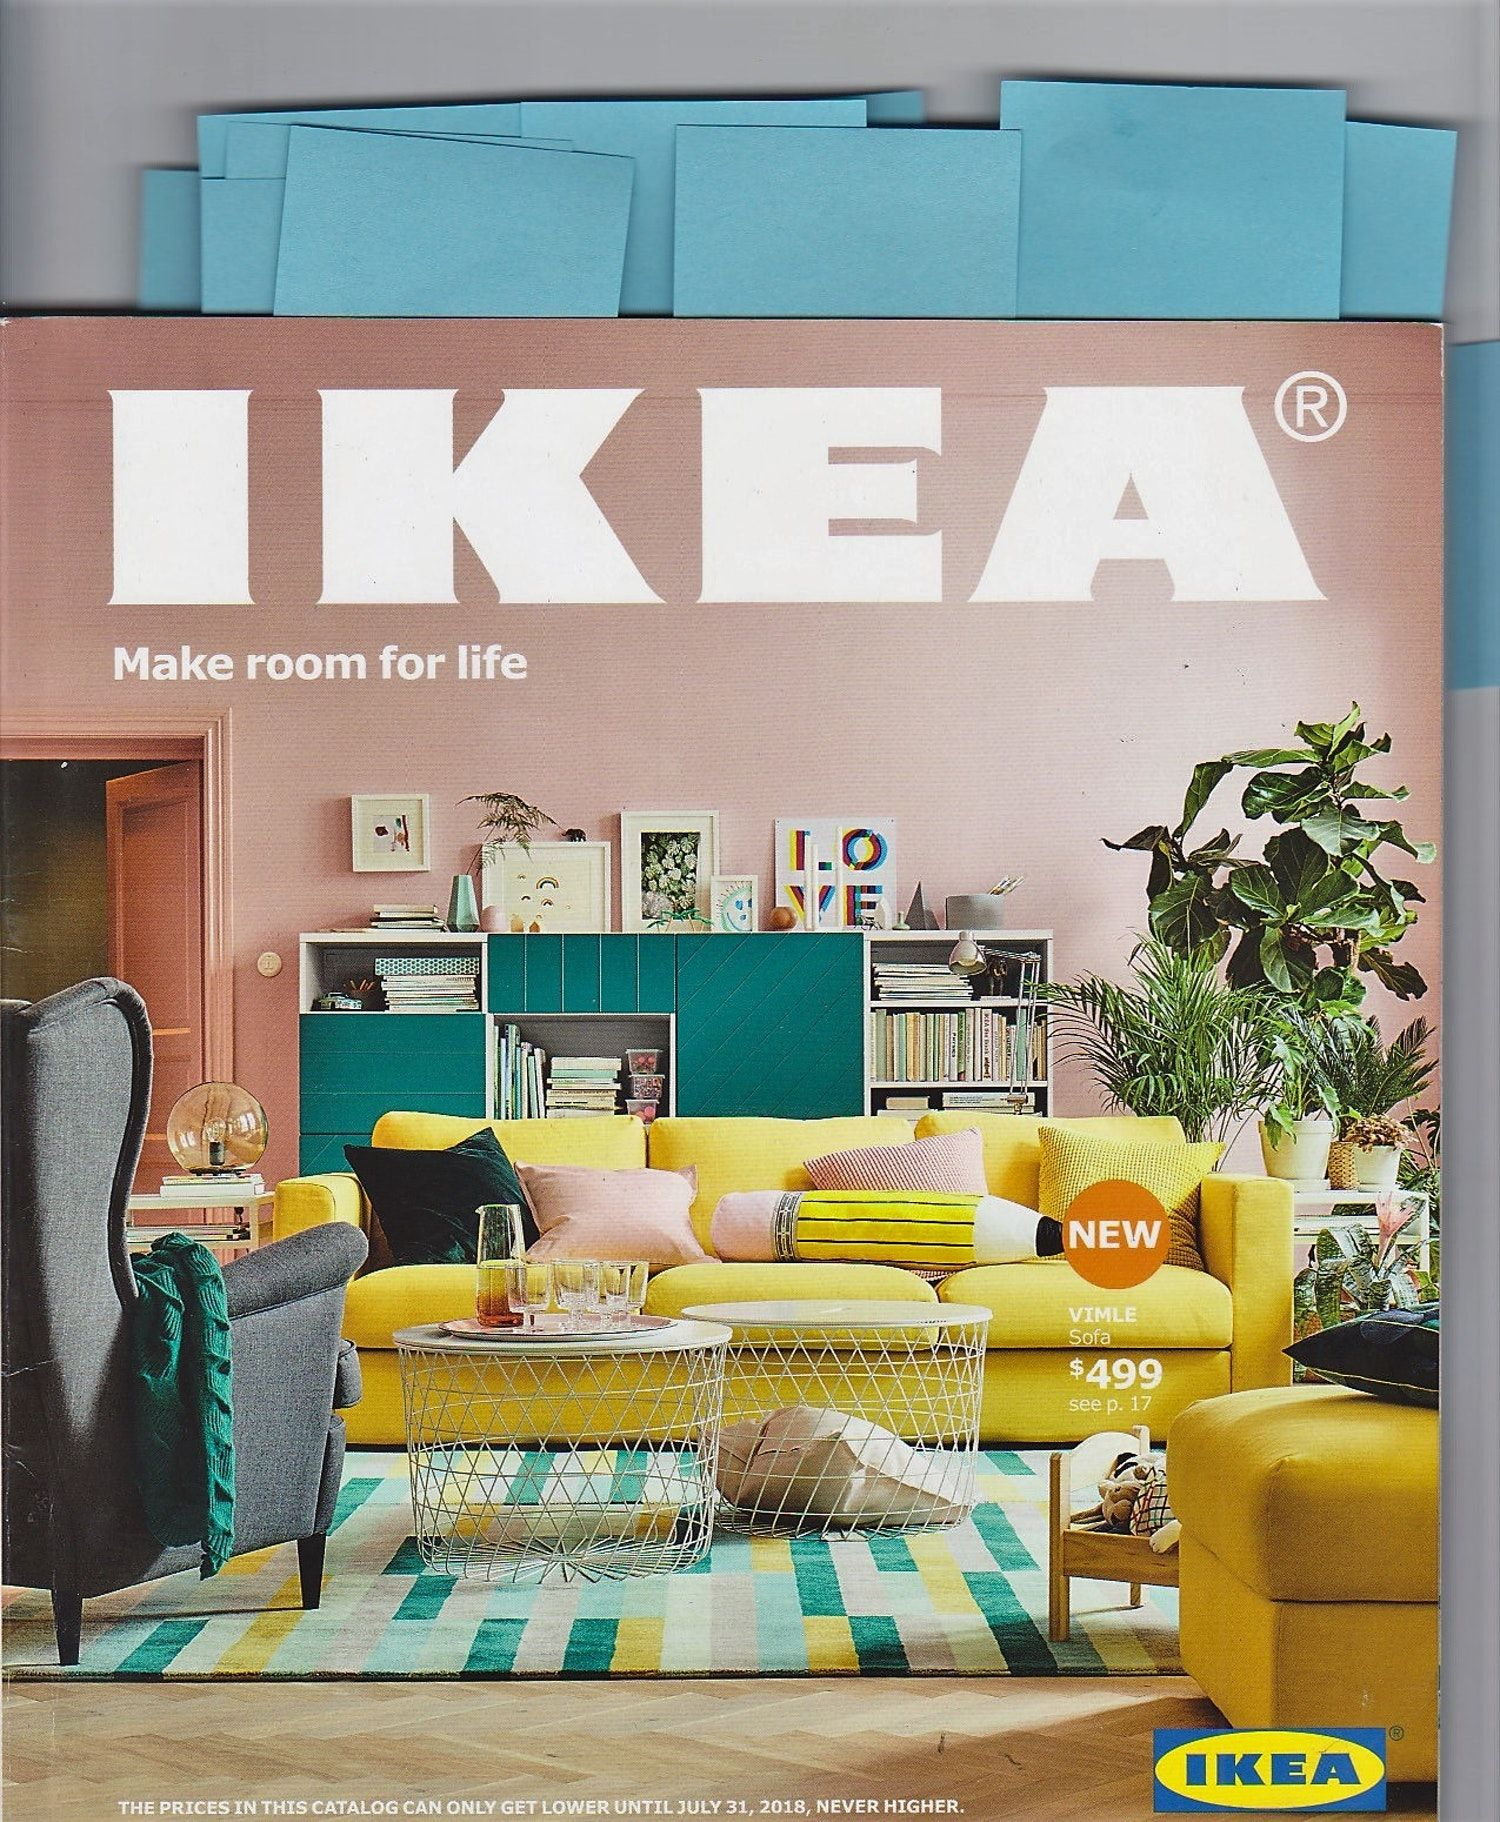 Ikea 2018 Catalog Sneak Peek A Top 10 Countdown Of Favorite New